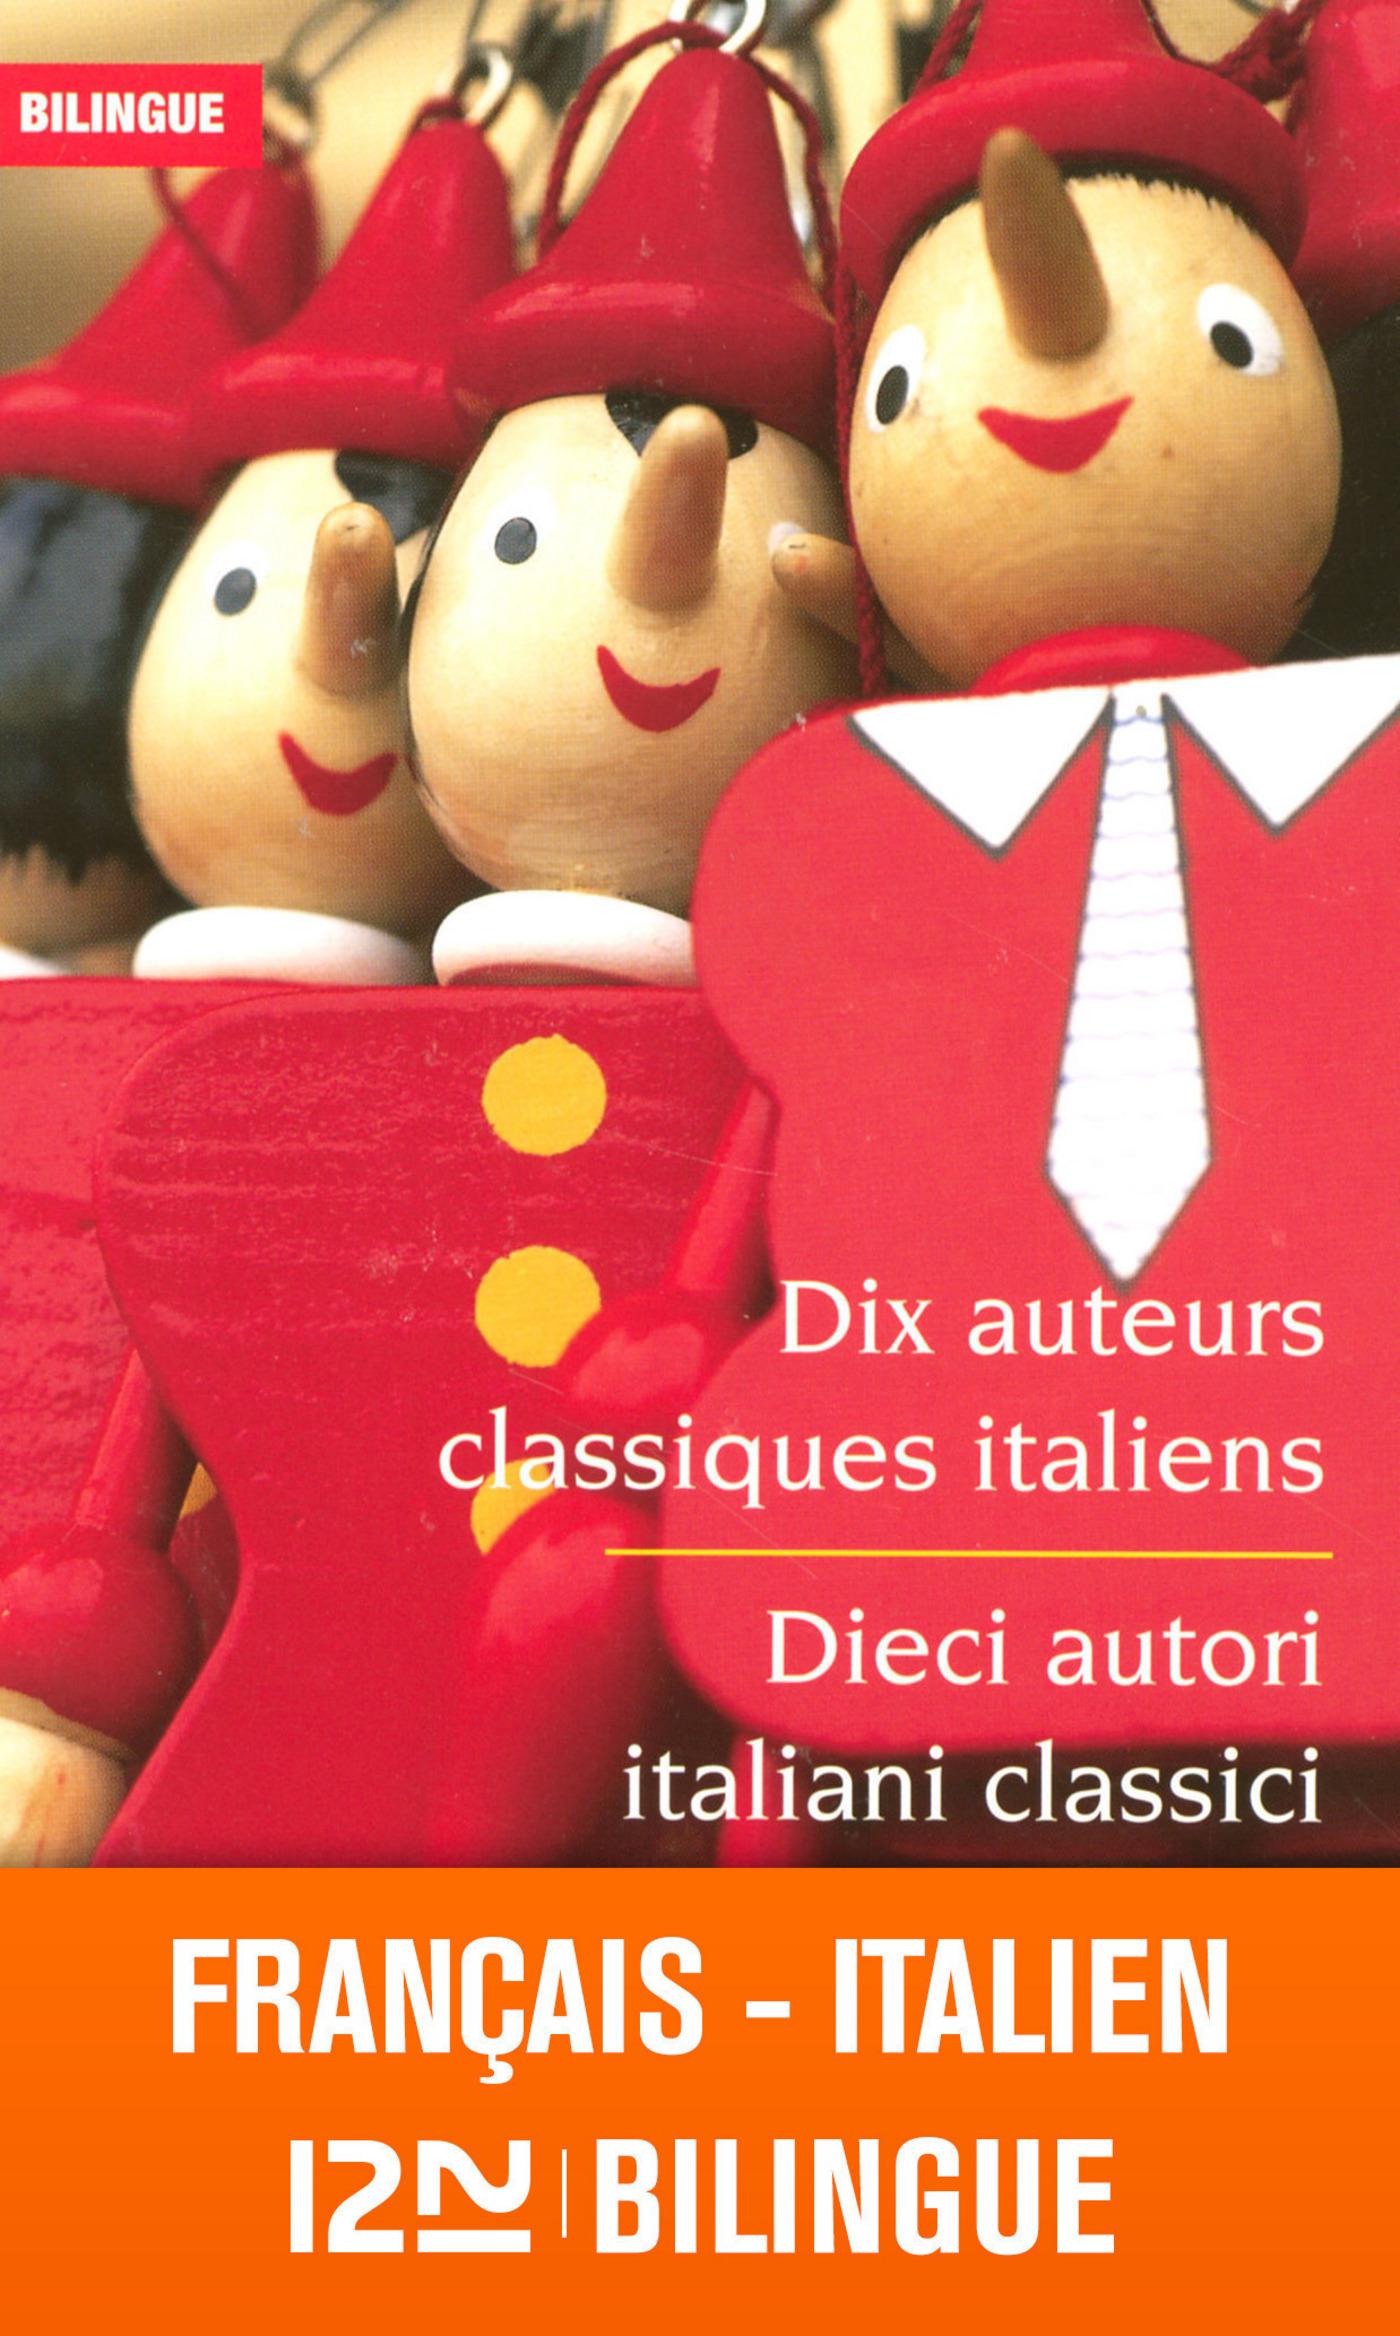 Bilingue Dix auteurs classiques / Dieci autori classici